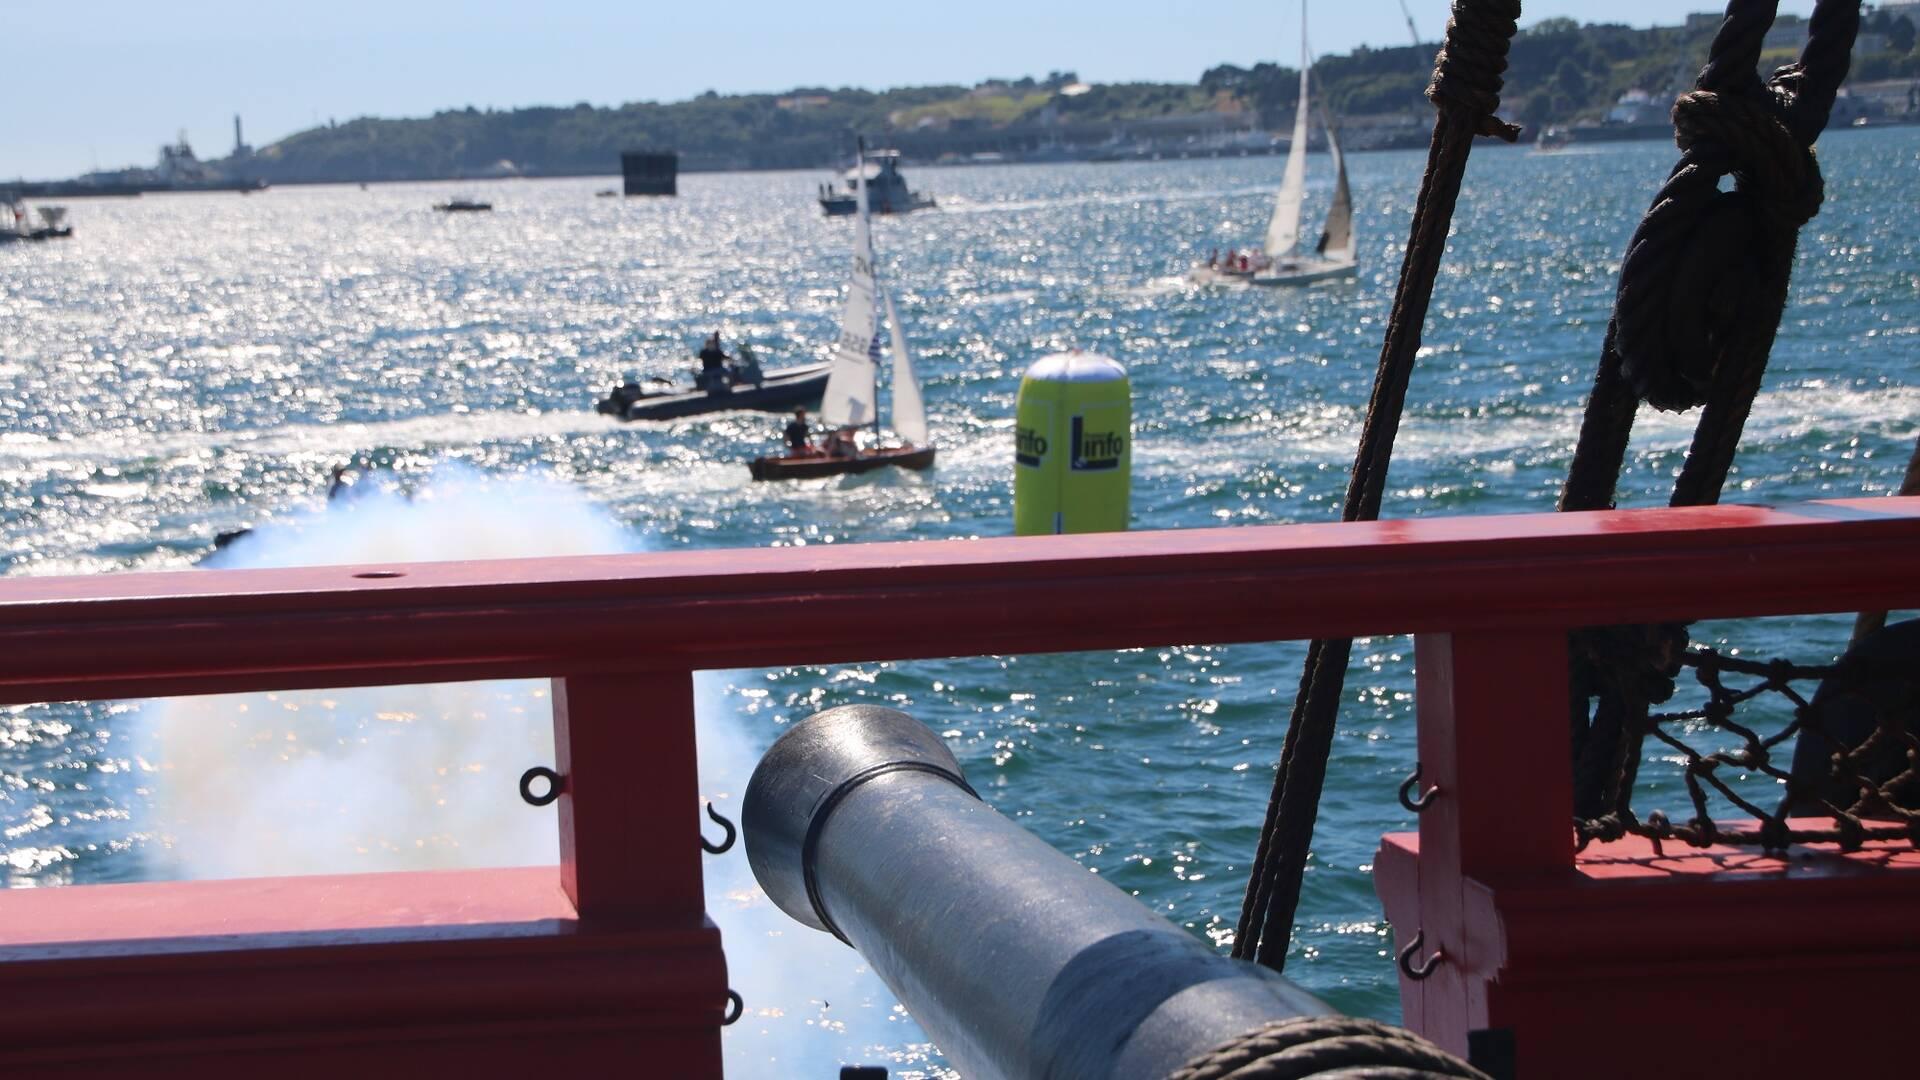 Coup de canon - Brest 2016 © M. de Villartay